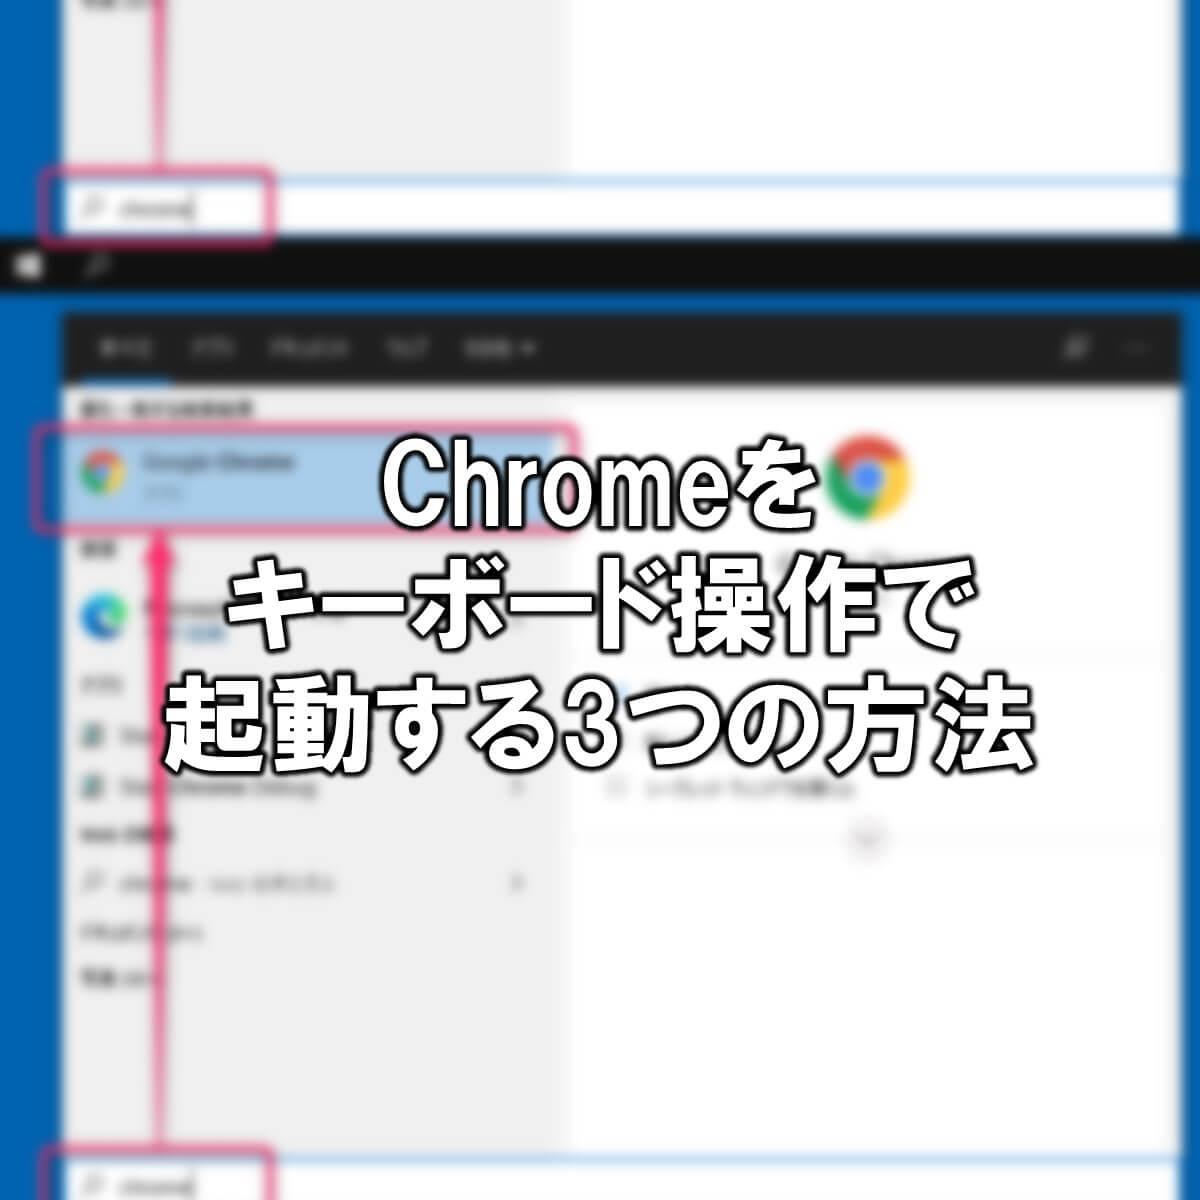 Chromeをキーボード操作で起動する3つの方法